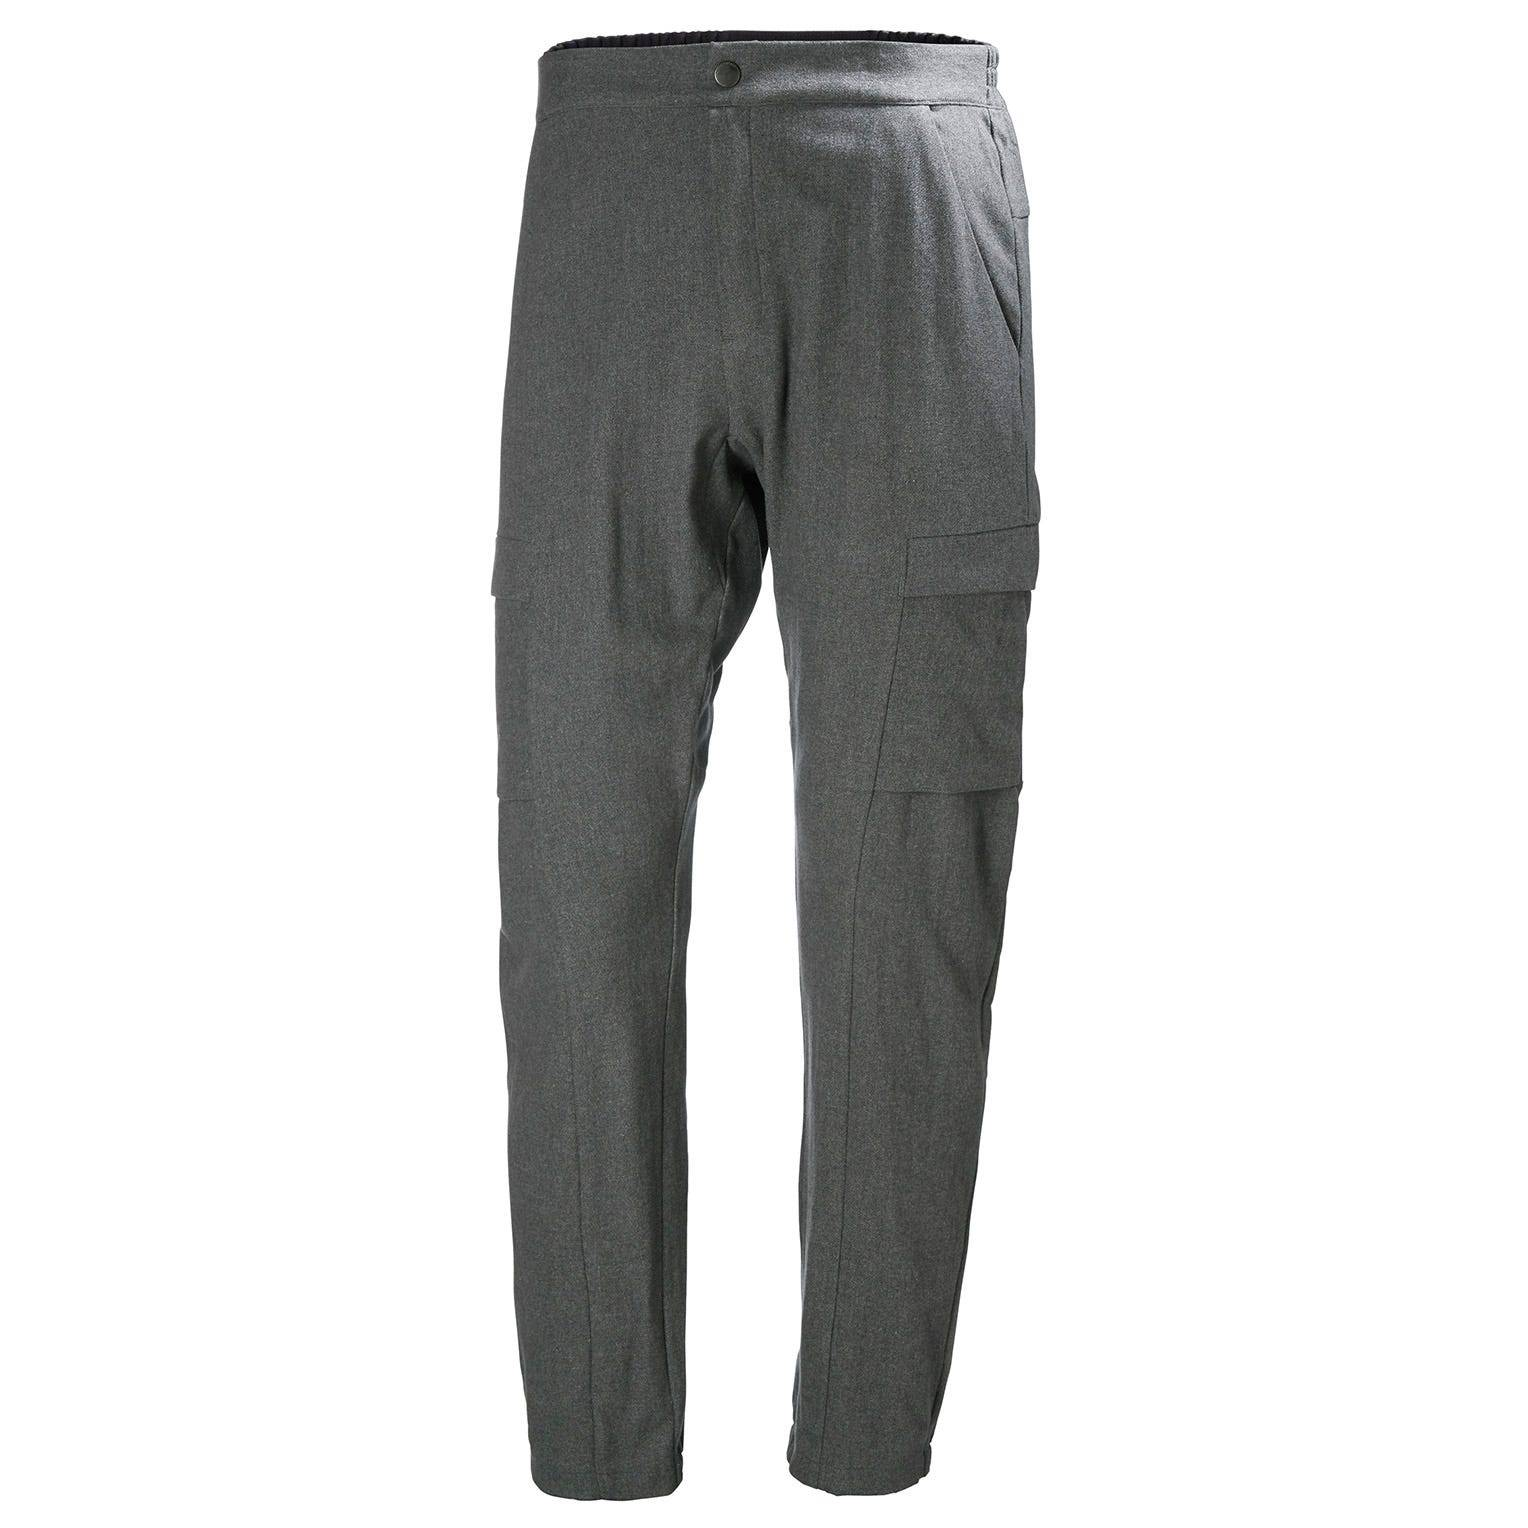 Helly Hansen Wool Travel Hiking Pant Grey XXL